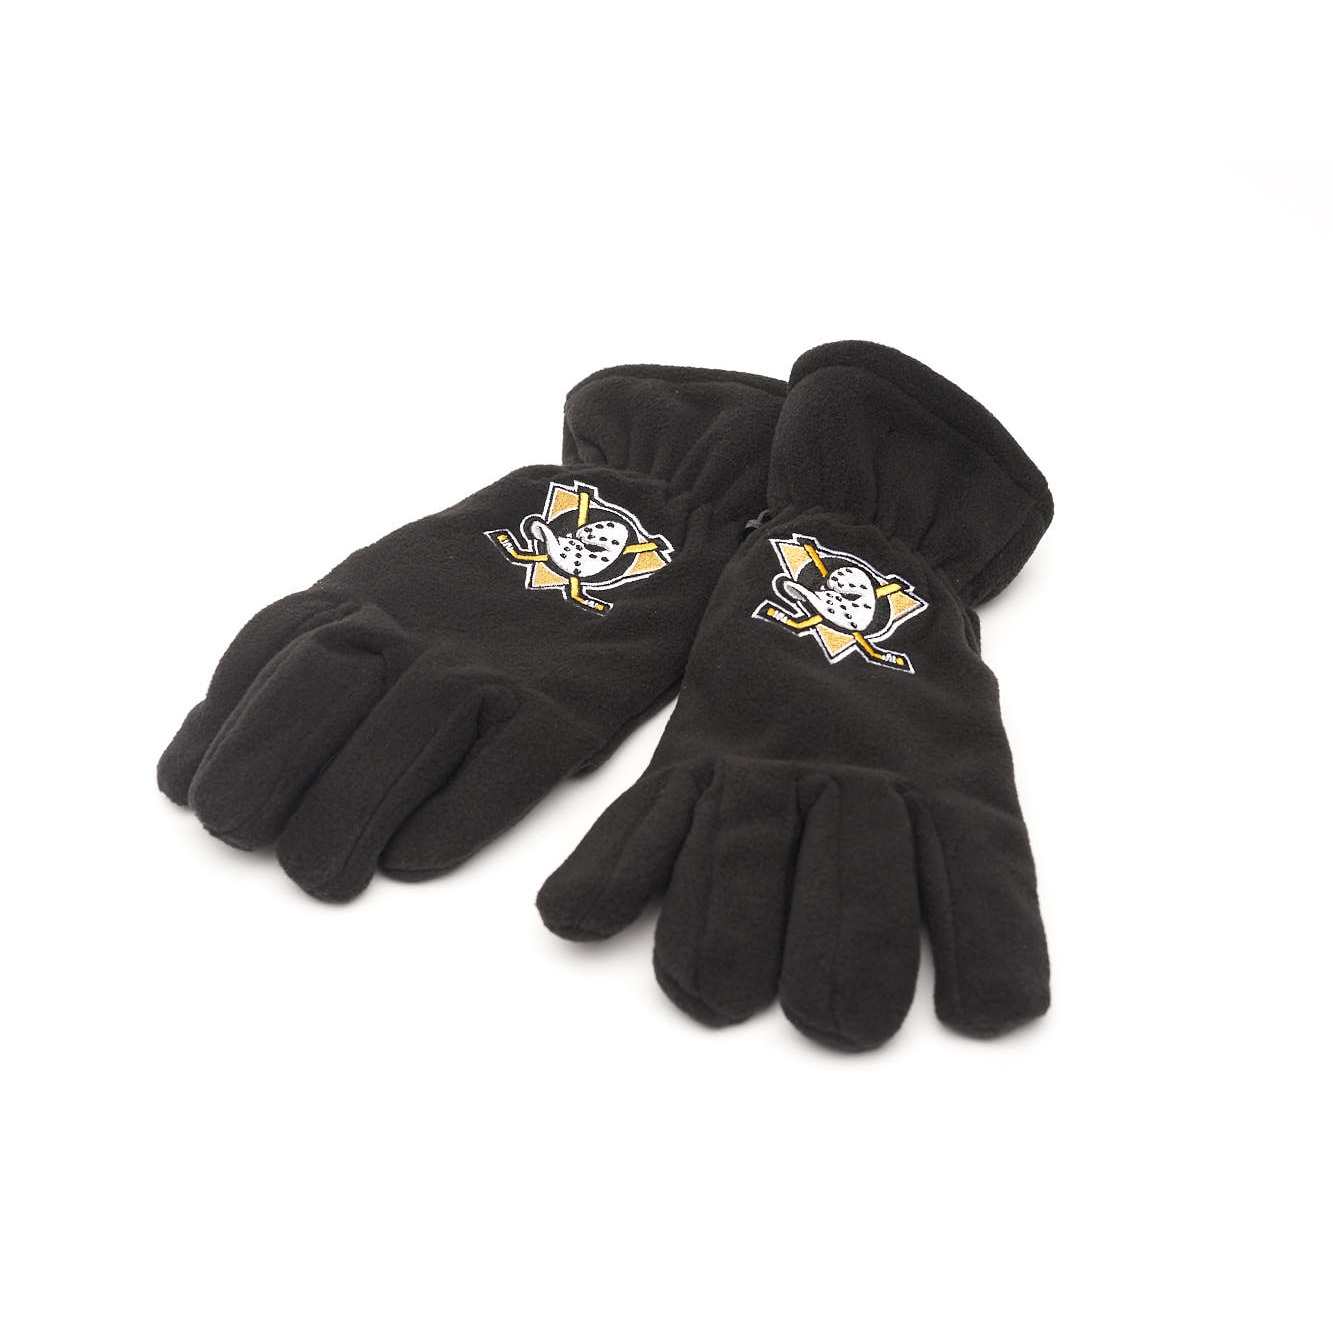 07024 Перчатки Anaheim Ducks